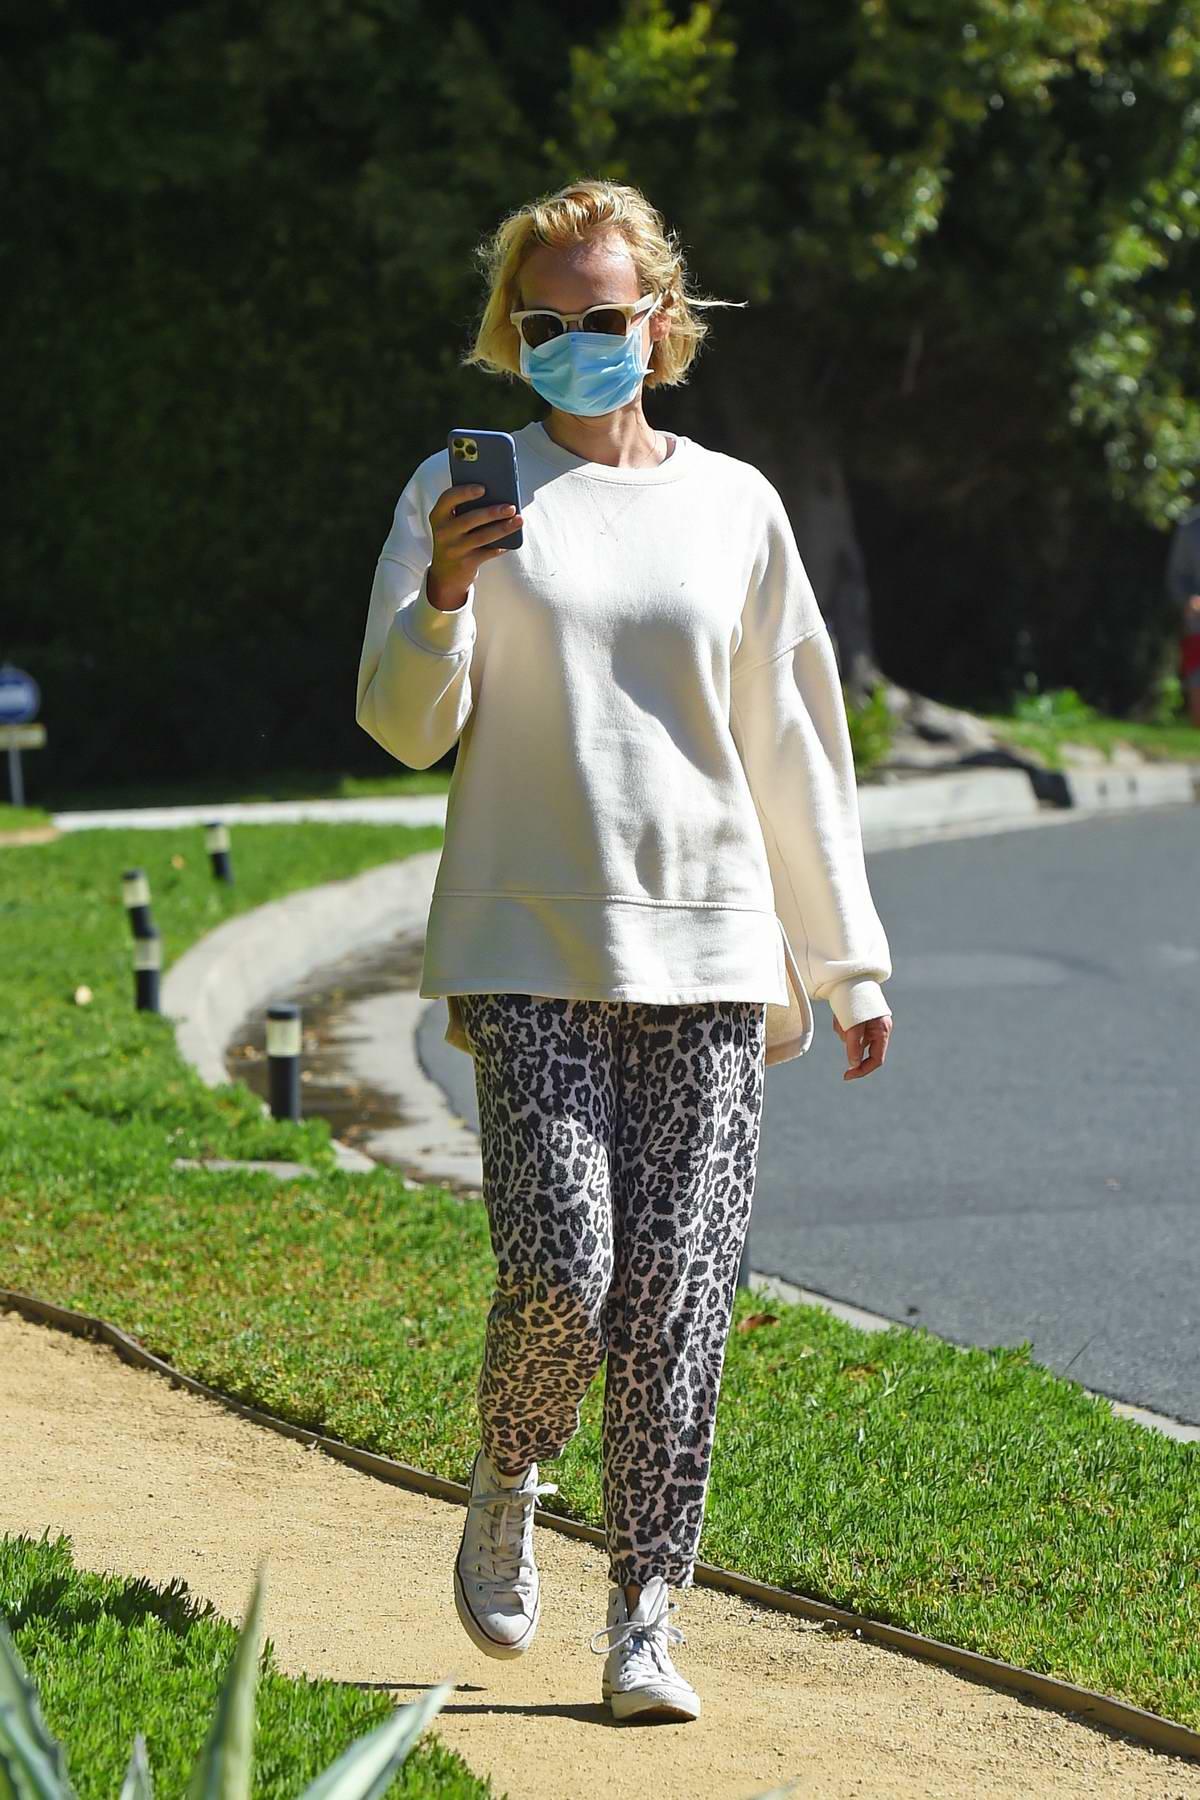 Diane Kruger wears animal print sweatpants as she takes a walk in Los Angeles